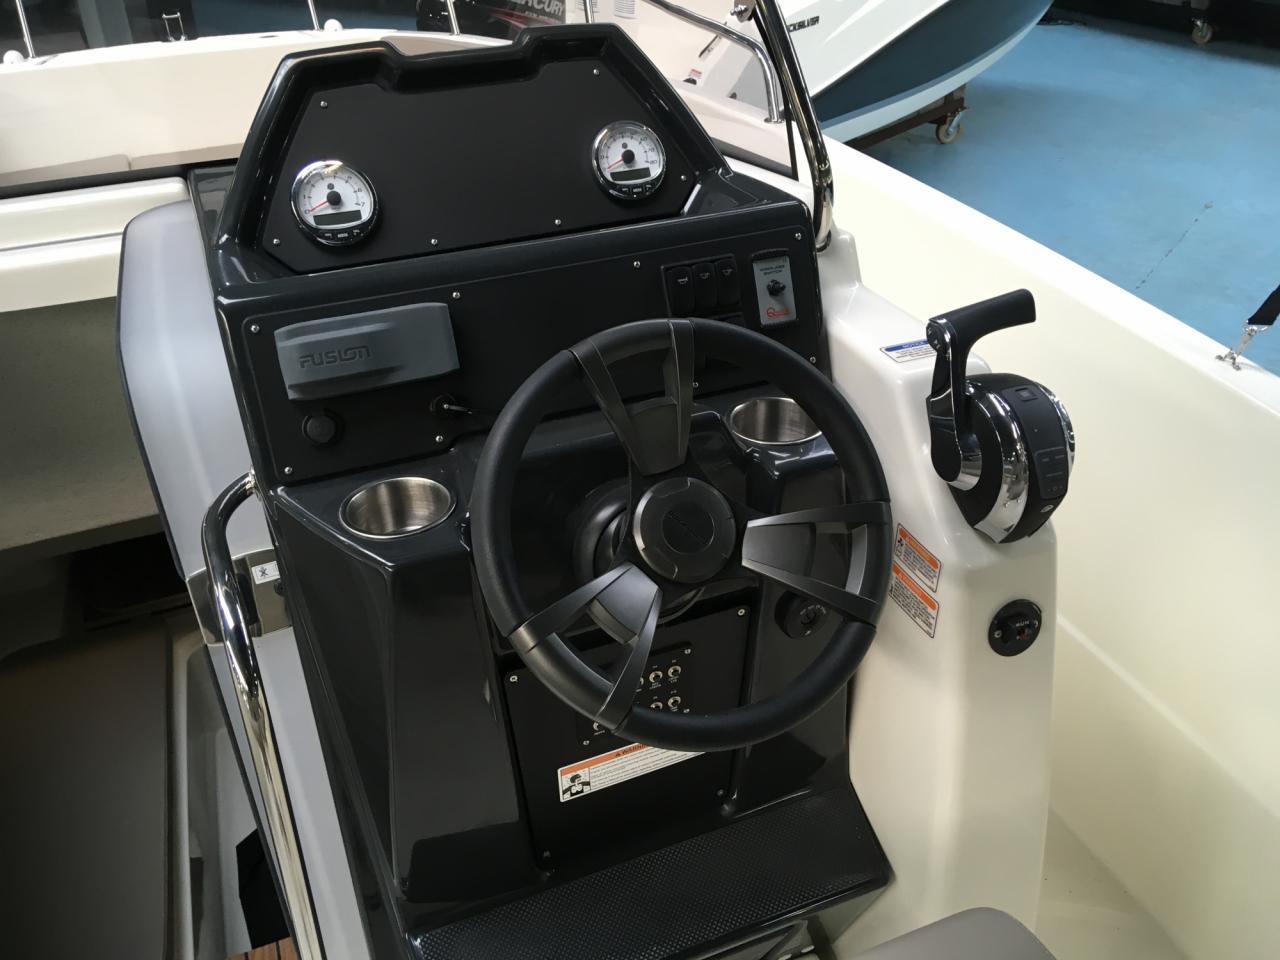 Quicksilver 755 activ open met Suzuki 300 pk! 15